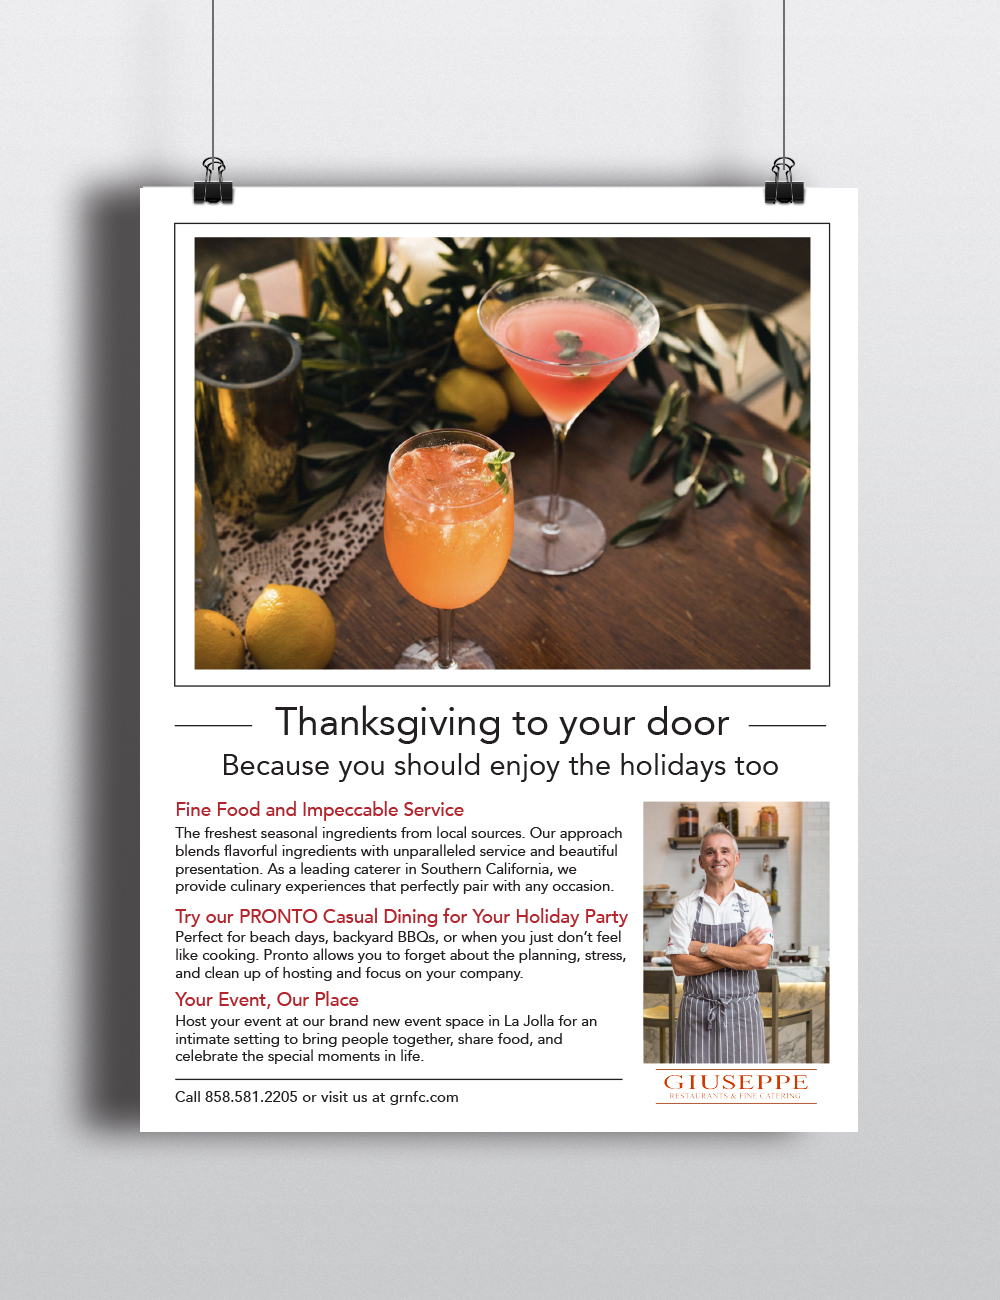 Giuseppe-Holiday-Ad-Version-1.jpg